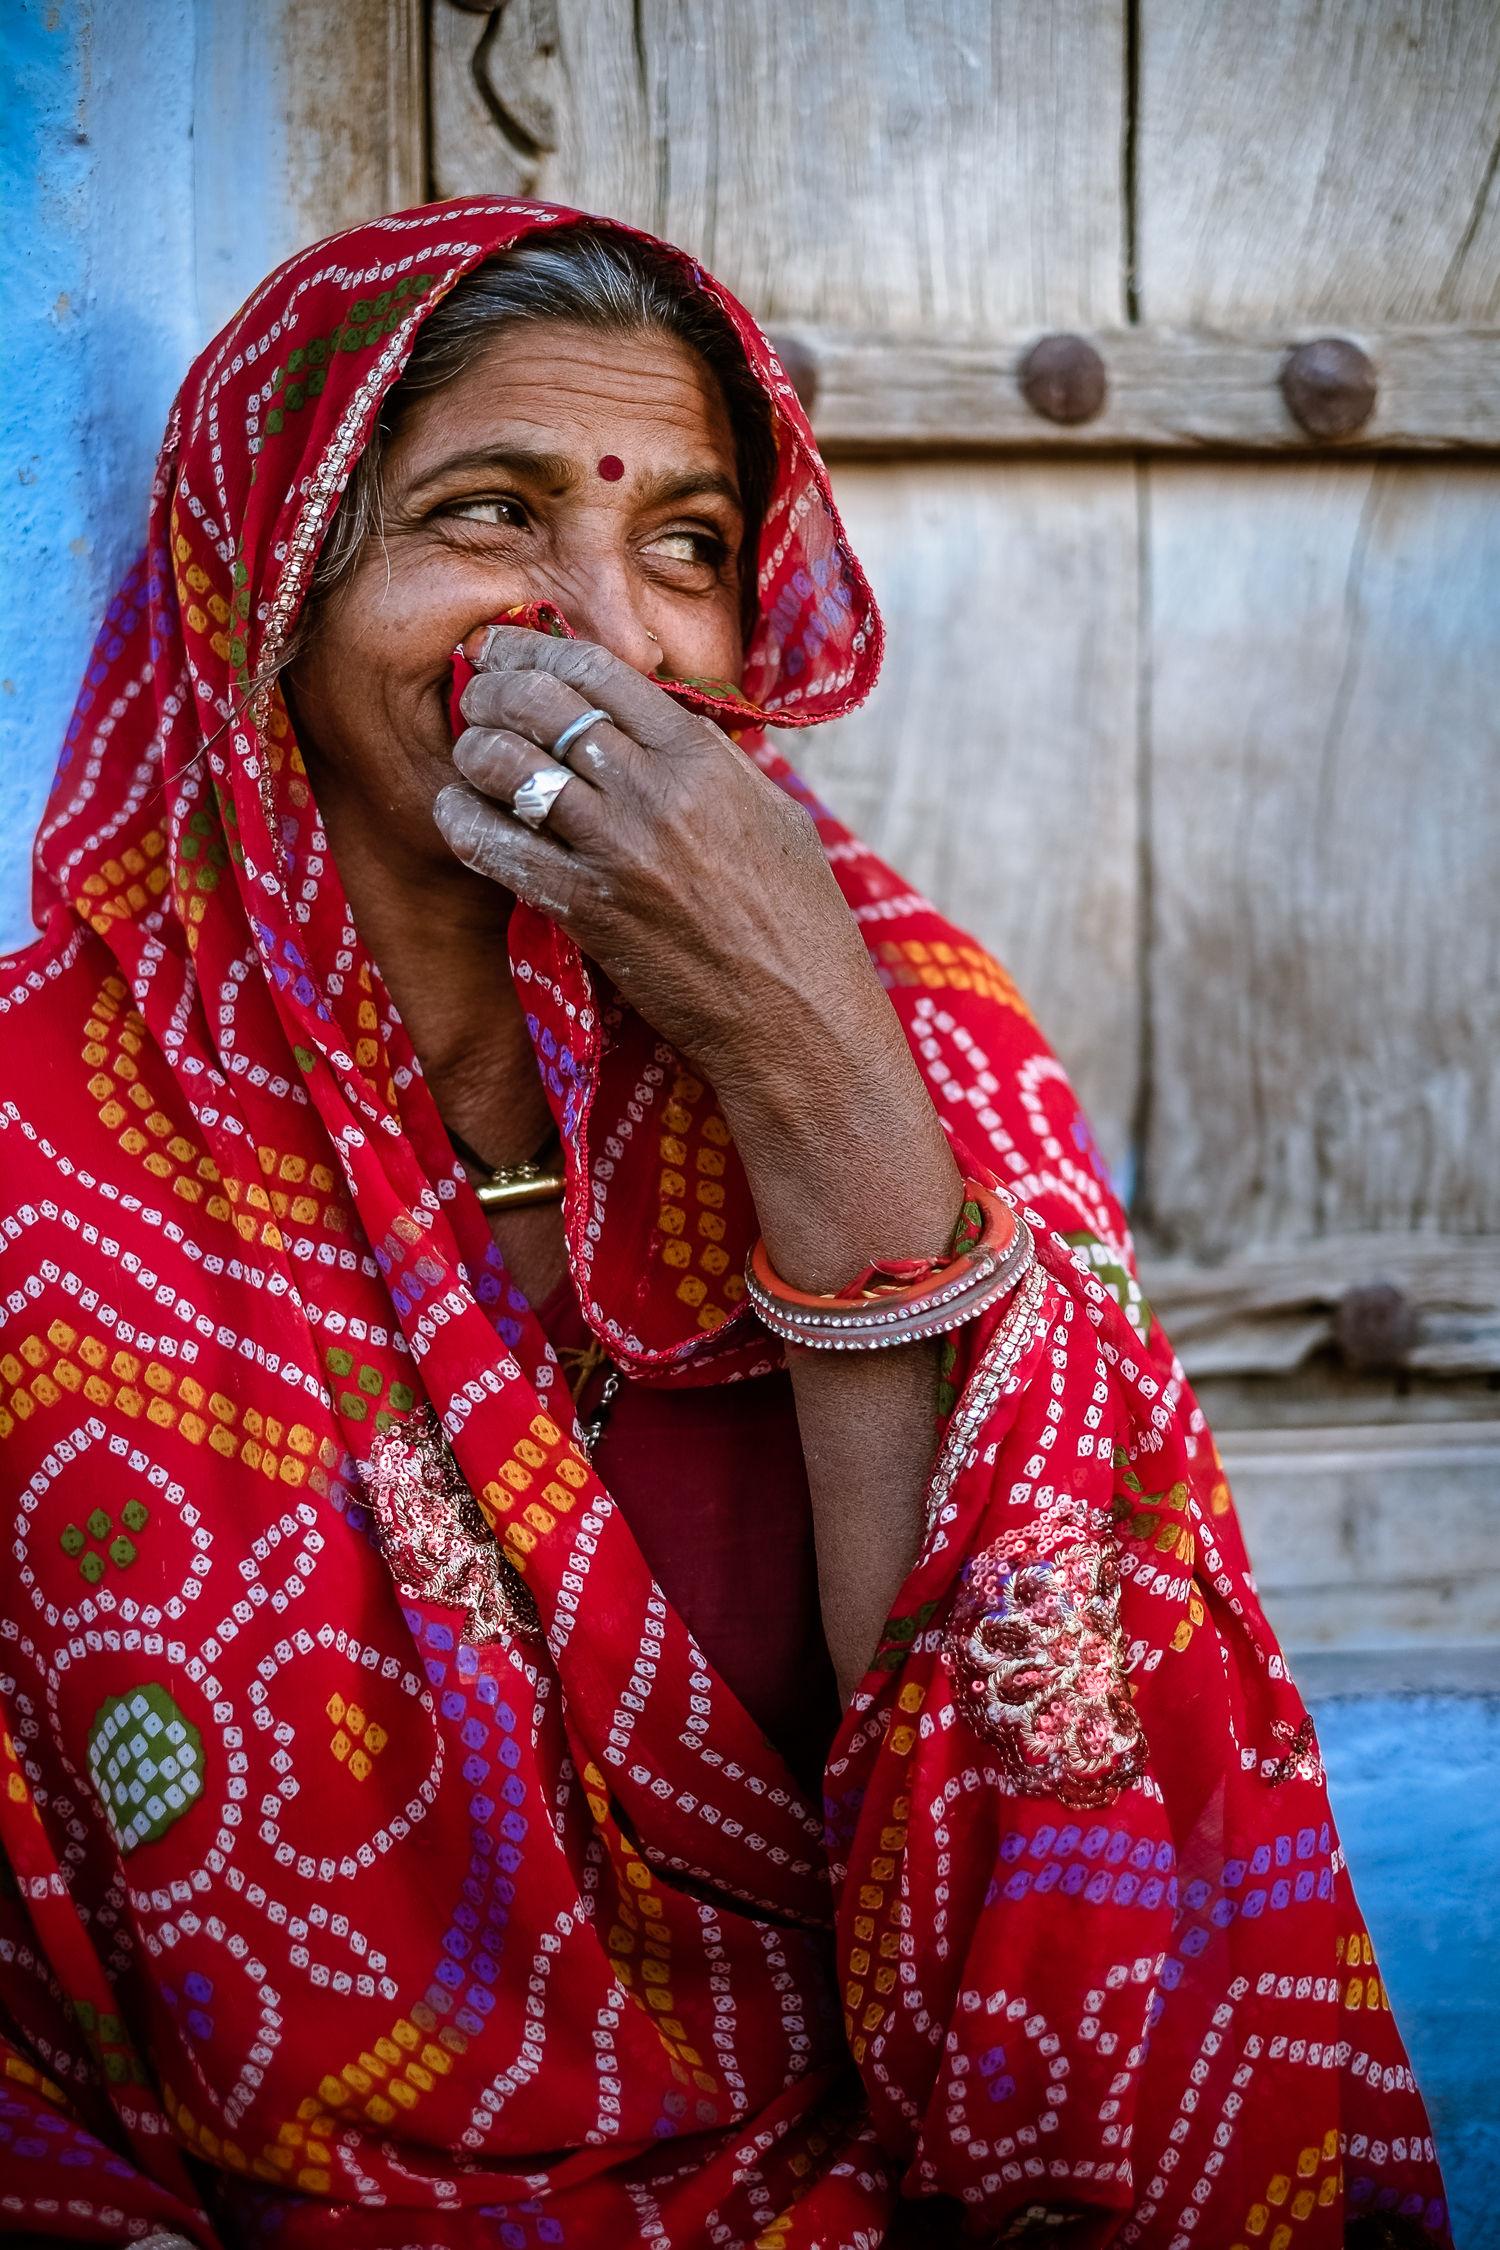 Woman laughing, Pachewar